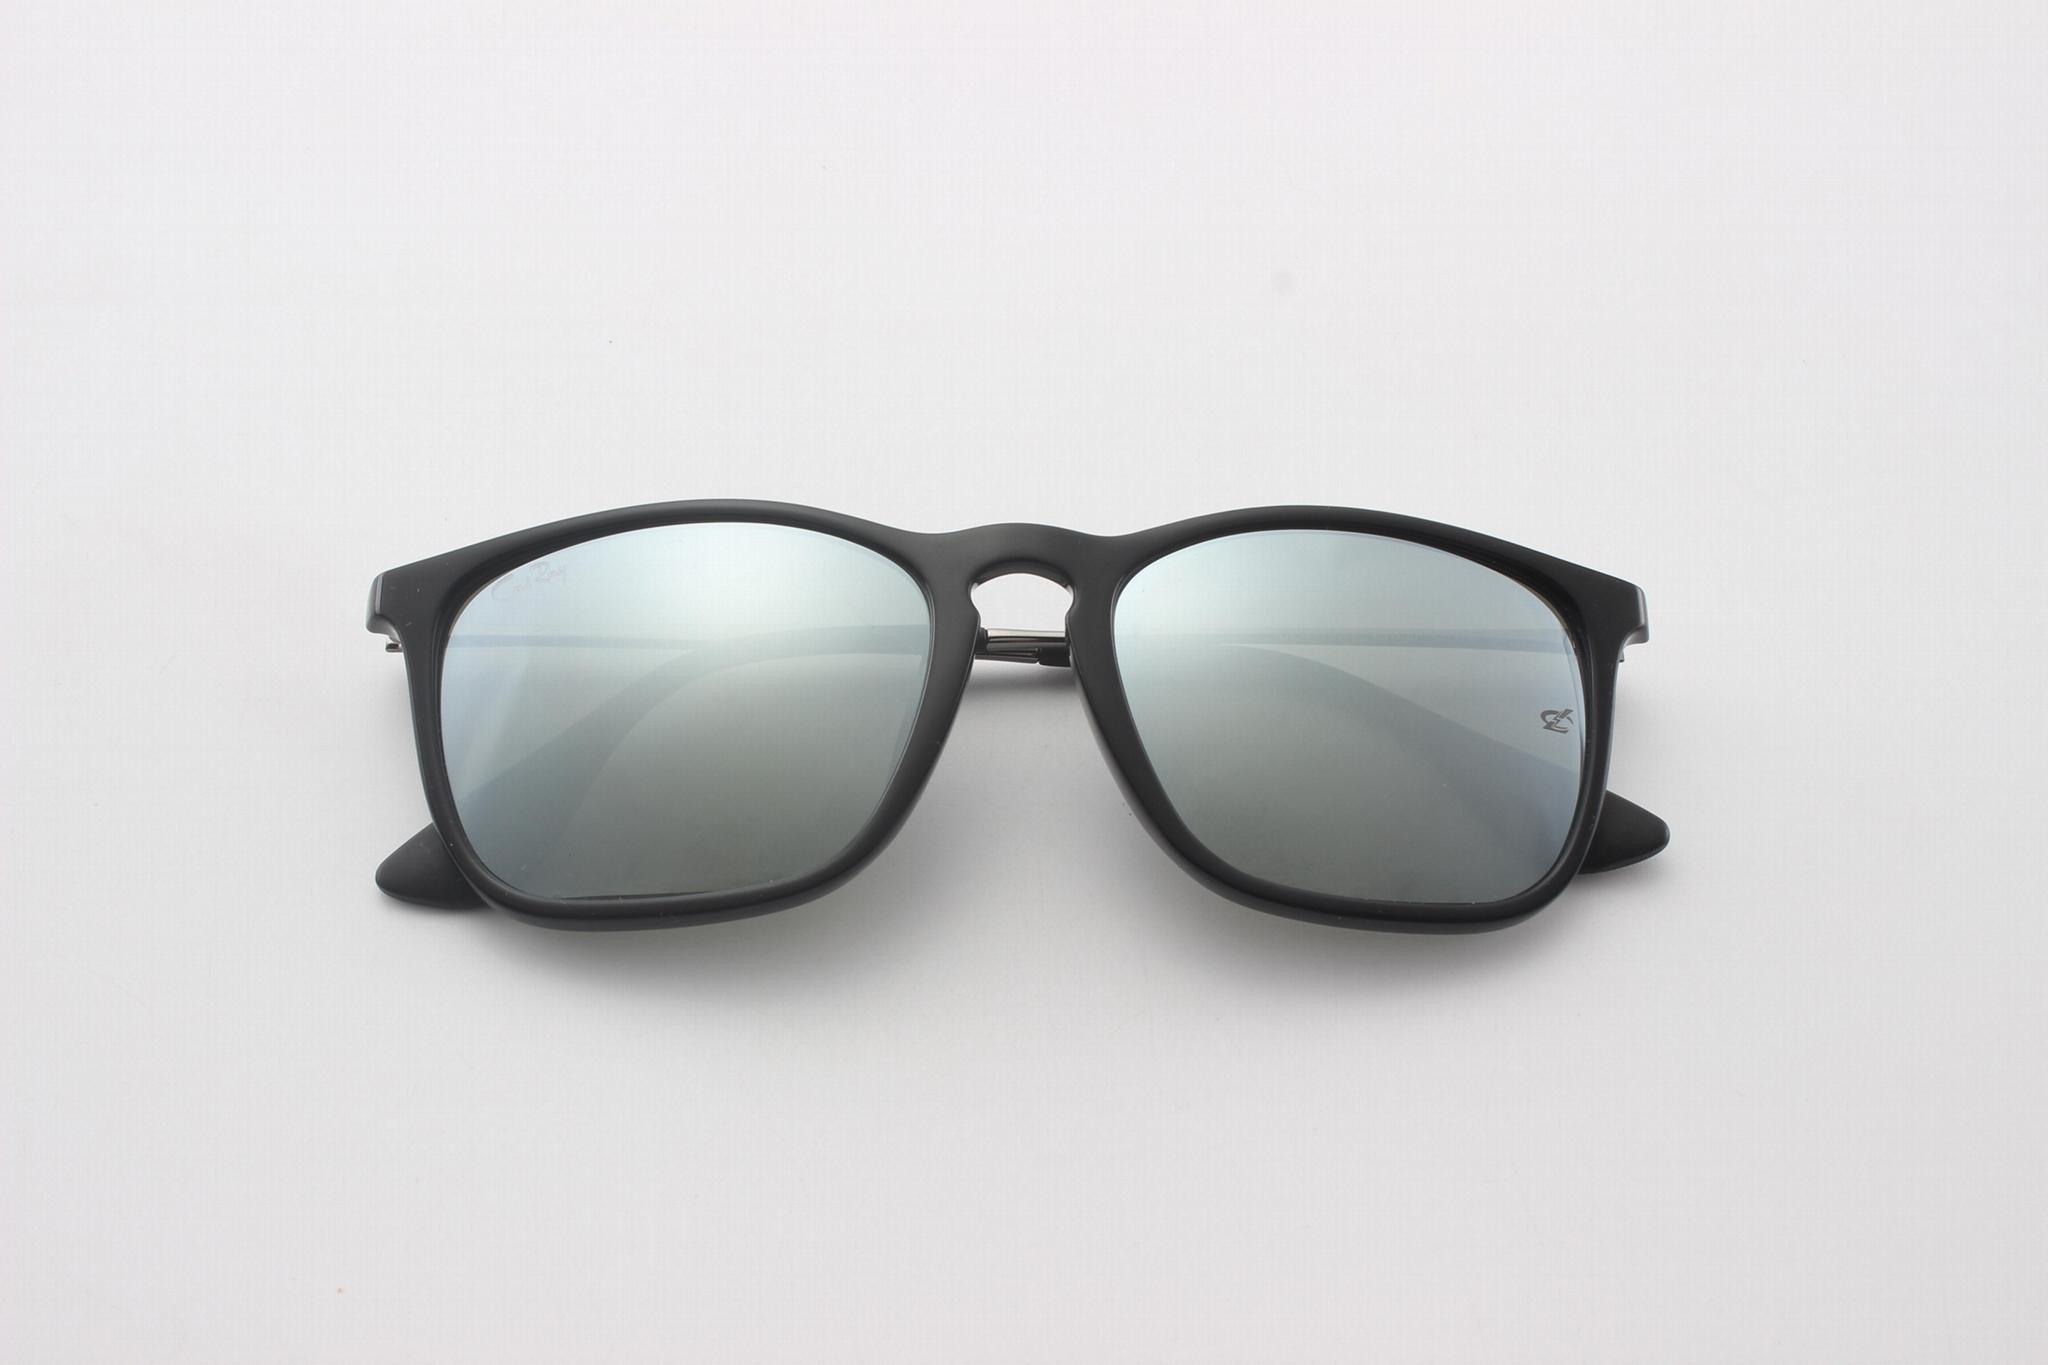 Cai Ray original Chris sunglasses CR4187 601/30 black/gray silve flash lens 54mm